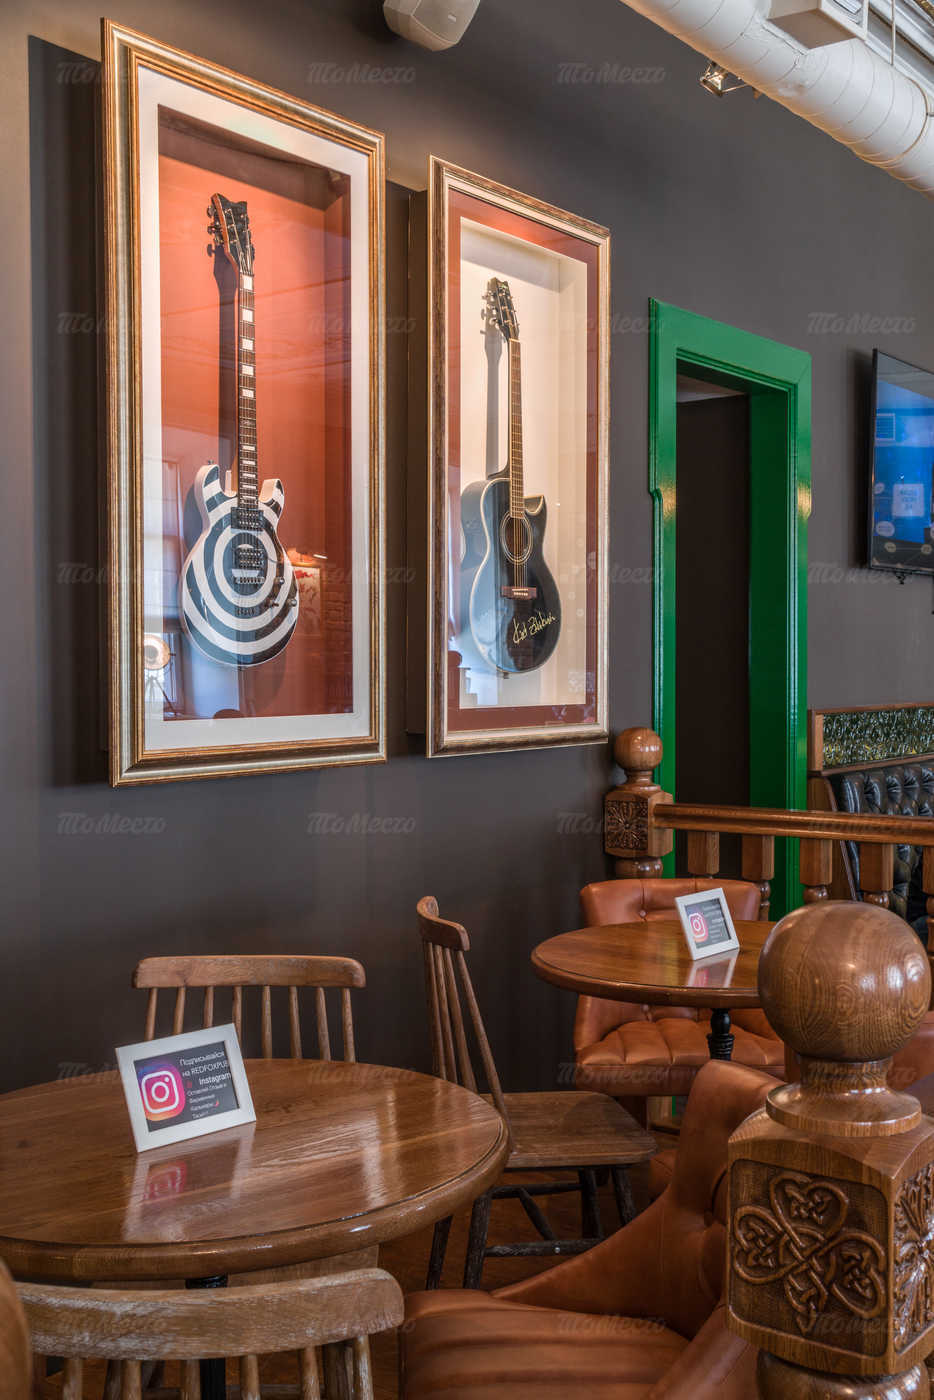 Меню гастропаба The Red Fox Pub & Grill на Большом Проспекте П.С.